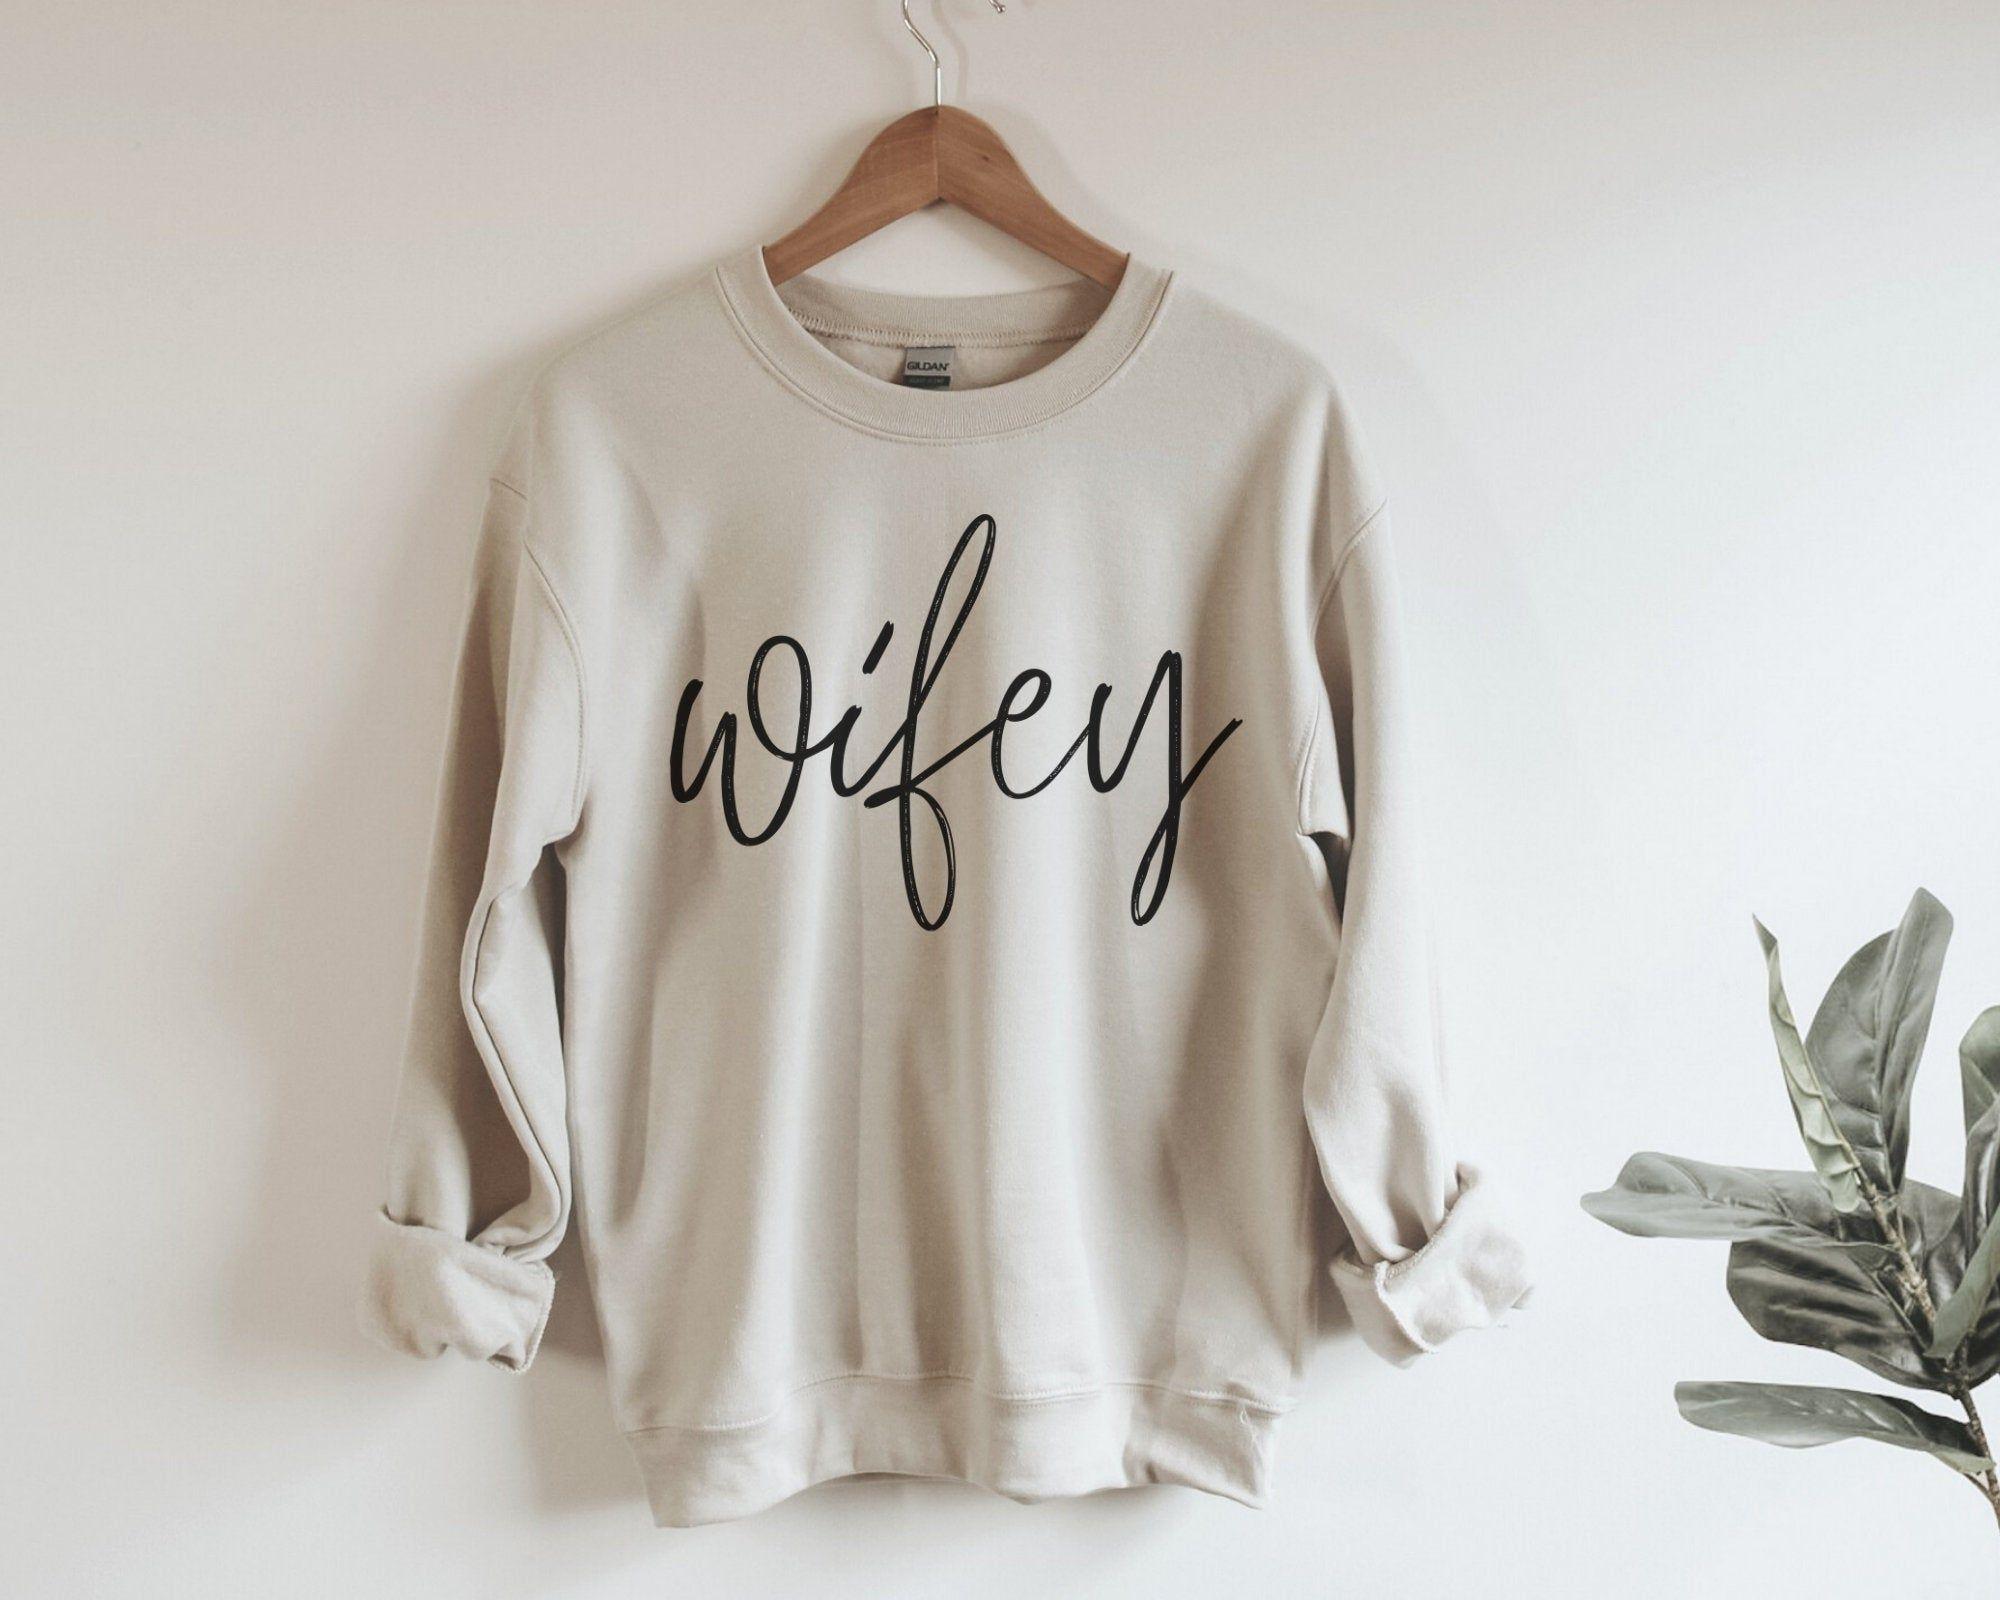 cute sweatshirt bride sweatshirt wifey shirt Bride Gift bridal shower gift friend engagement women sweatshirt engagement gift